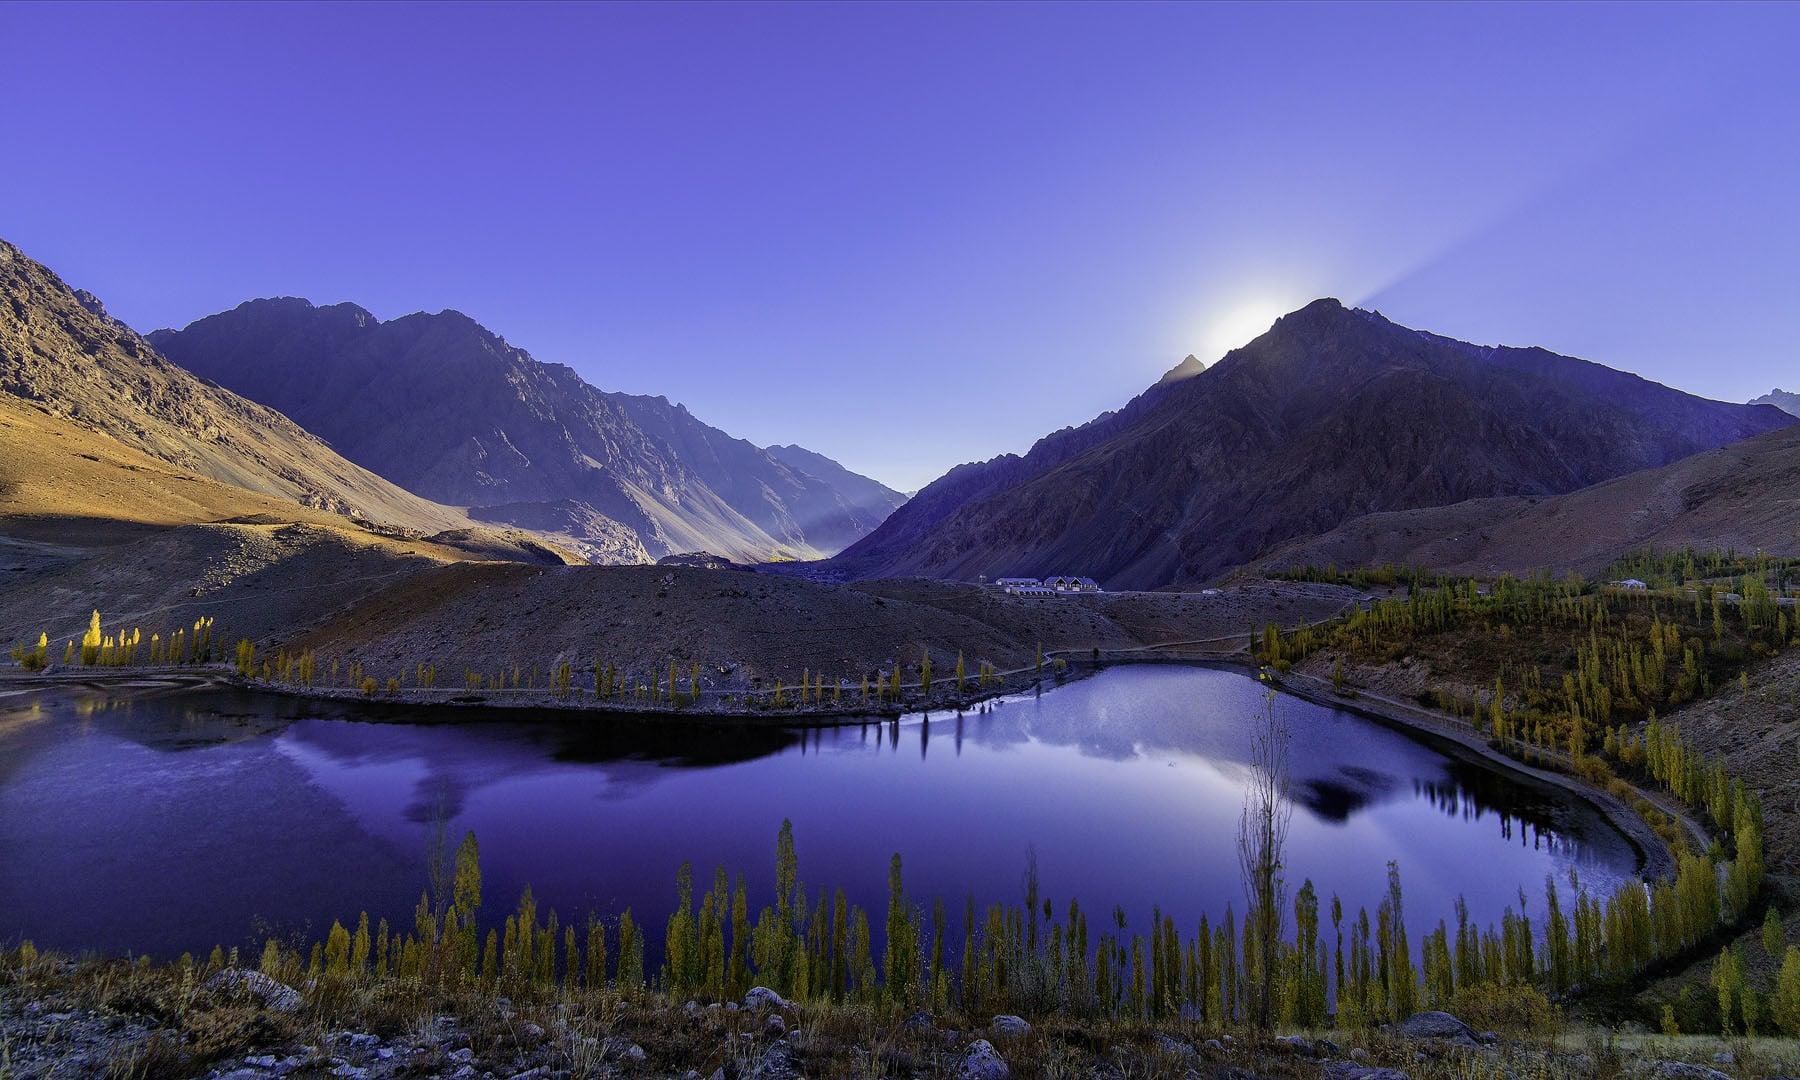 پھنڈر جھیل پر طلوعِ آفتاب کا منظر— فوٹو سید مہدی بخاری